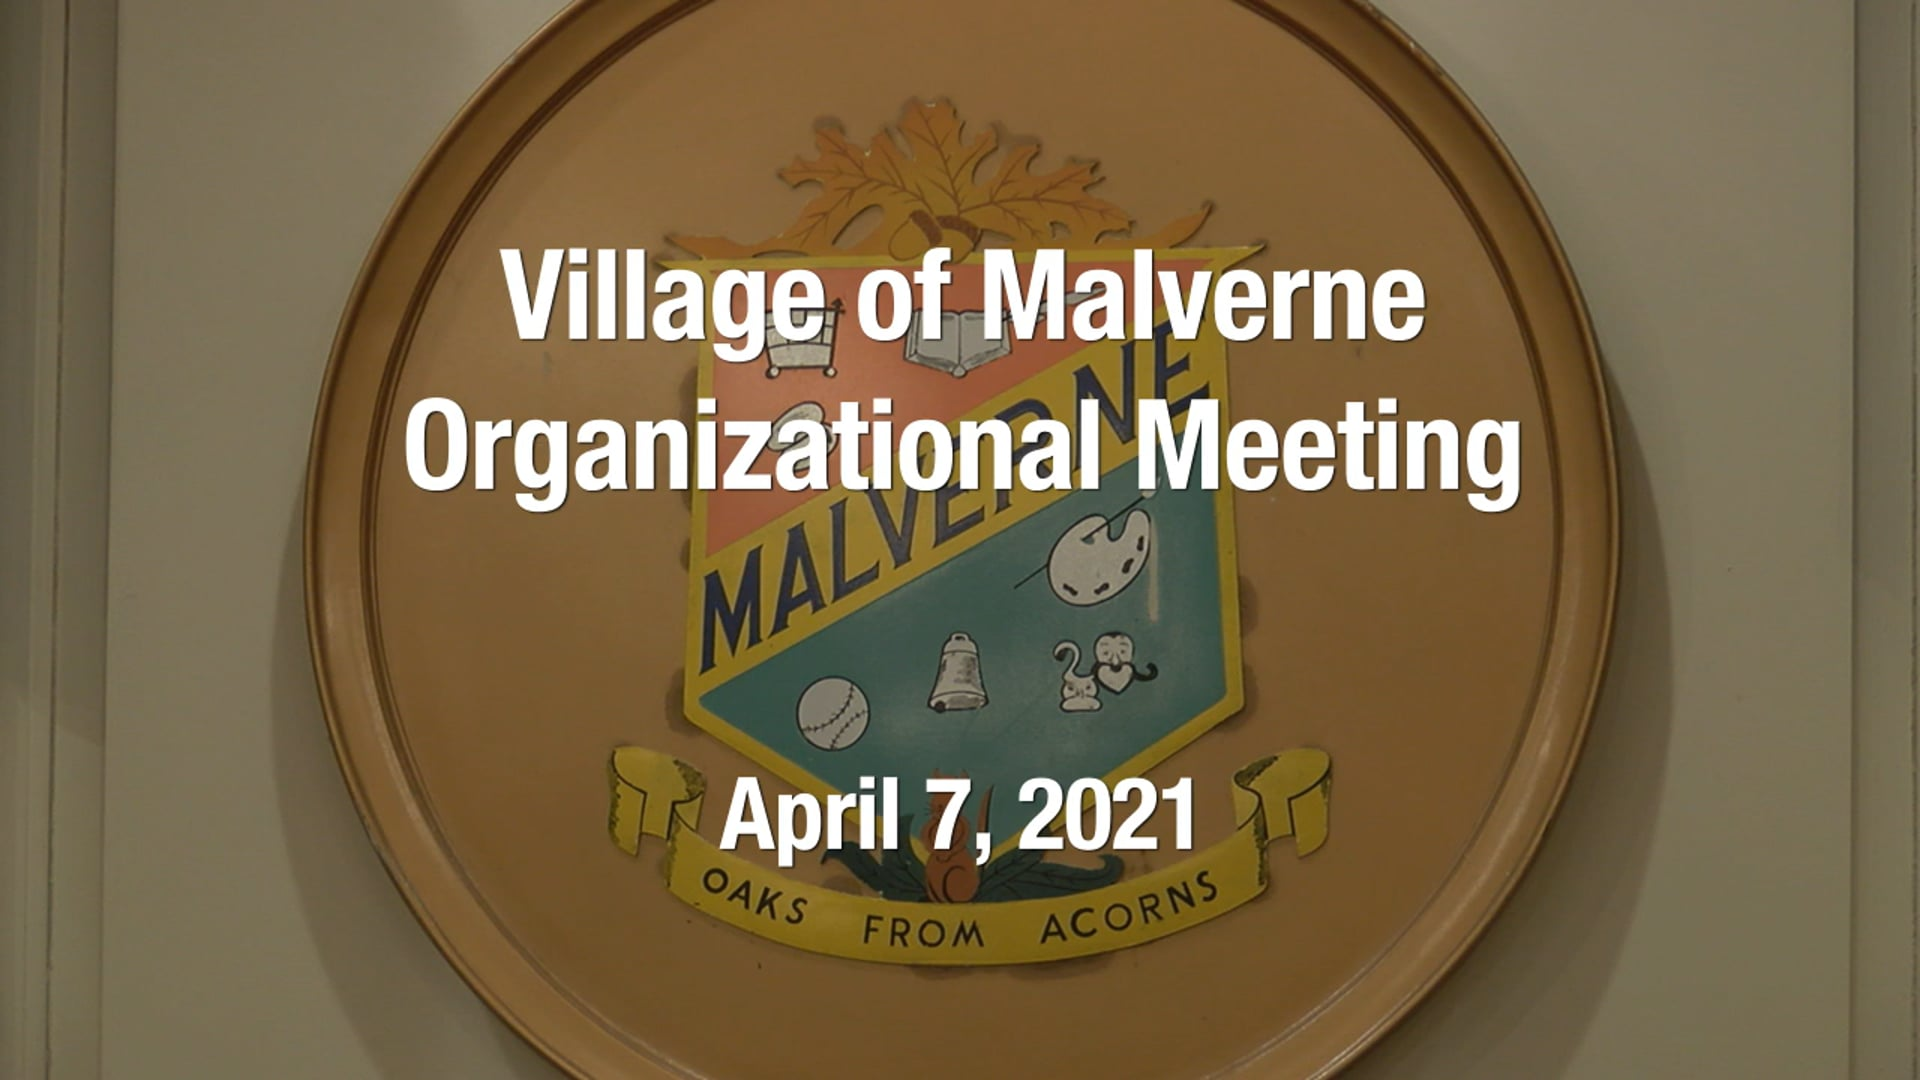 Village of Malverne Organizational Meeting, April 7 2021